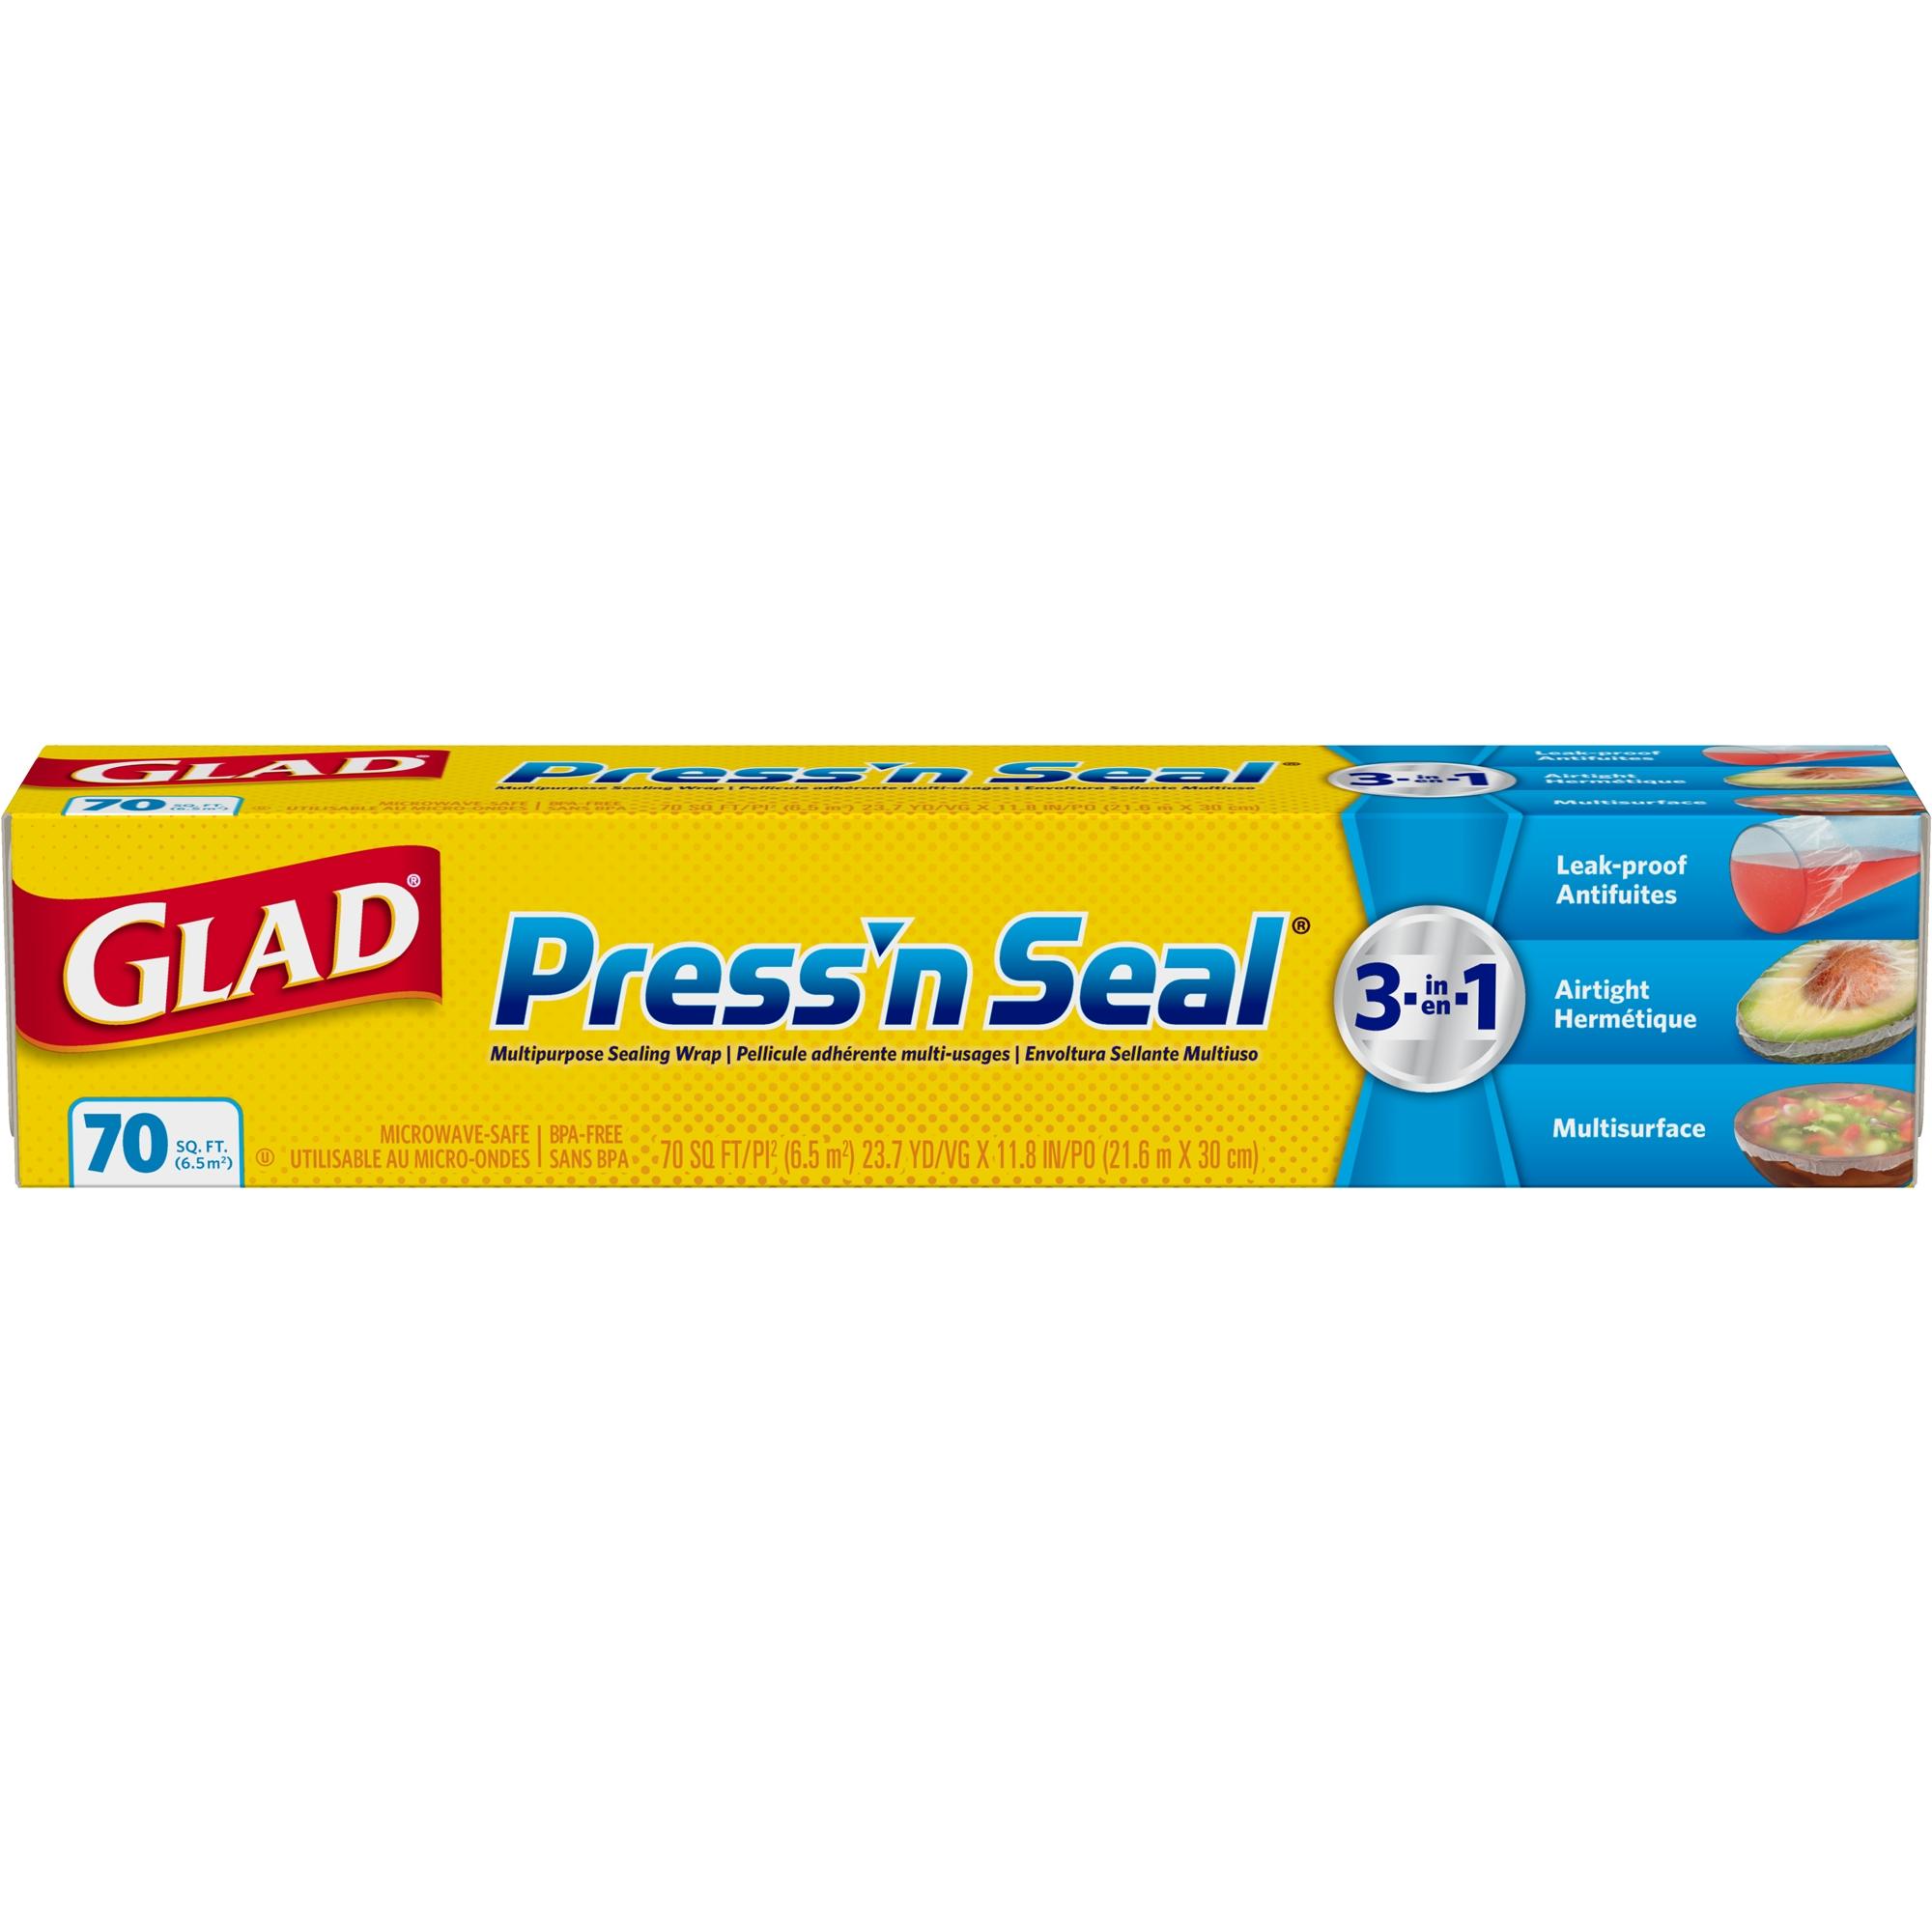 (3 pack) Glad Press'n Seal Plastic Food Wrap - 70 sq ft Roll